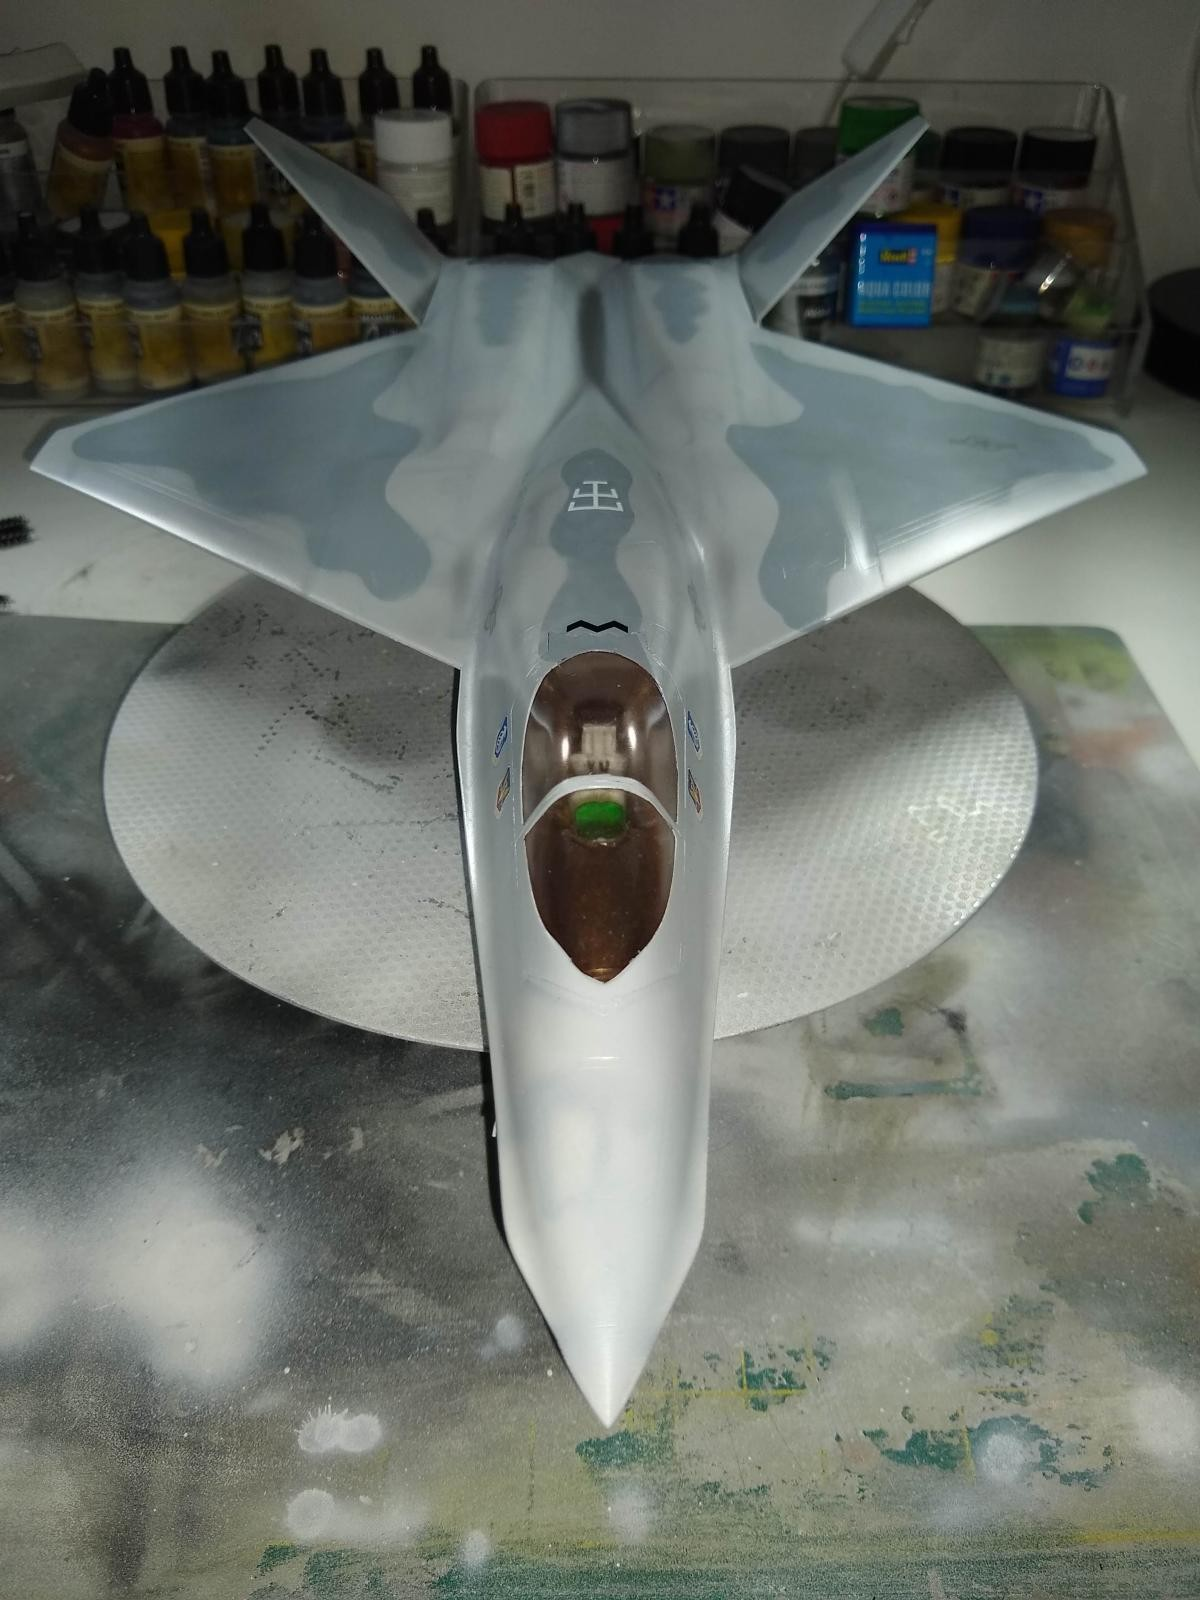 USAF NORTHROP YF-23 PROTOTYPE AIRCRAFT 1/48 HOBBY BOSS 81722